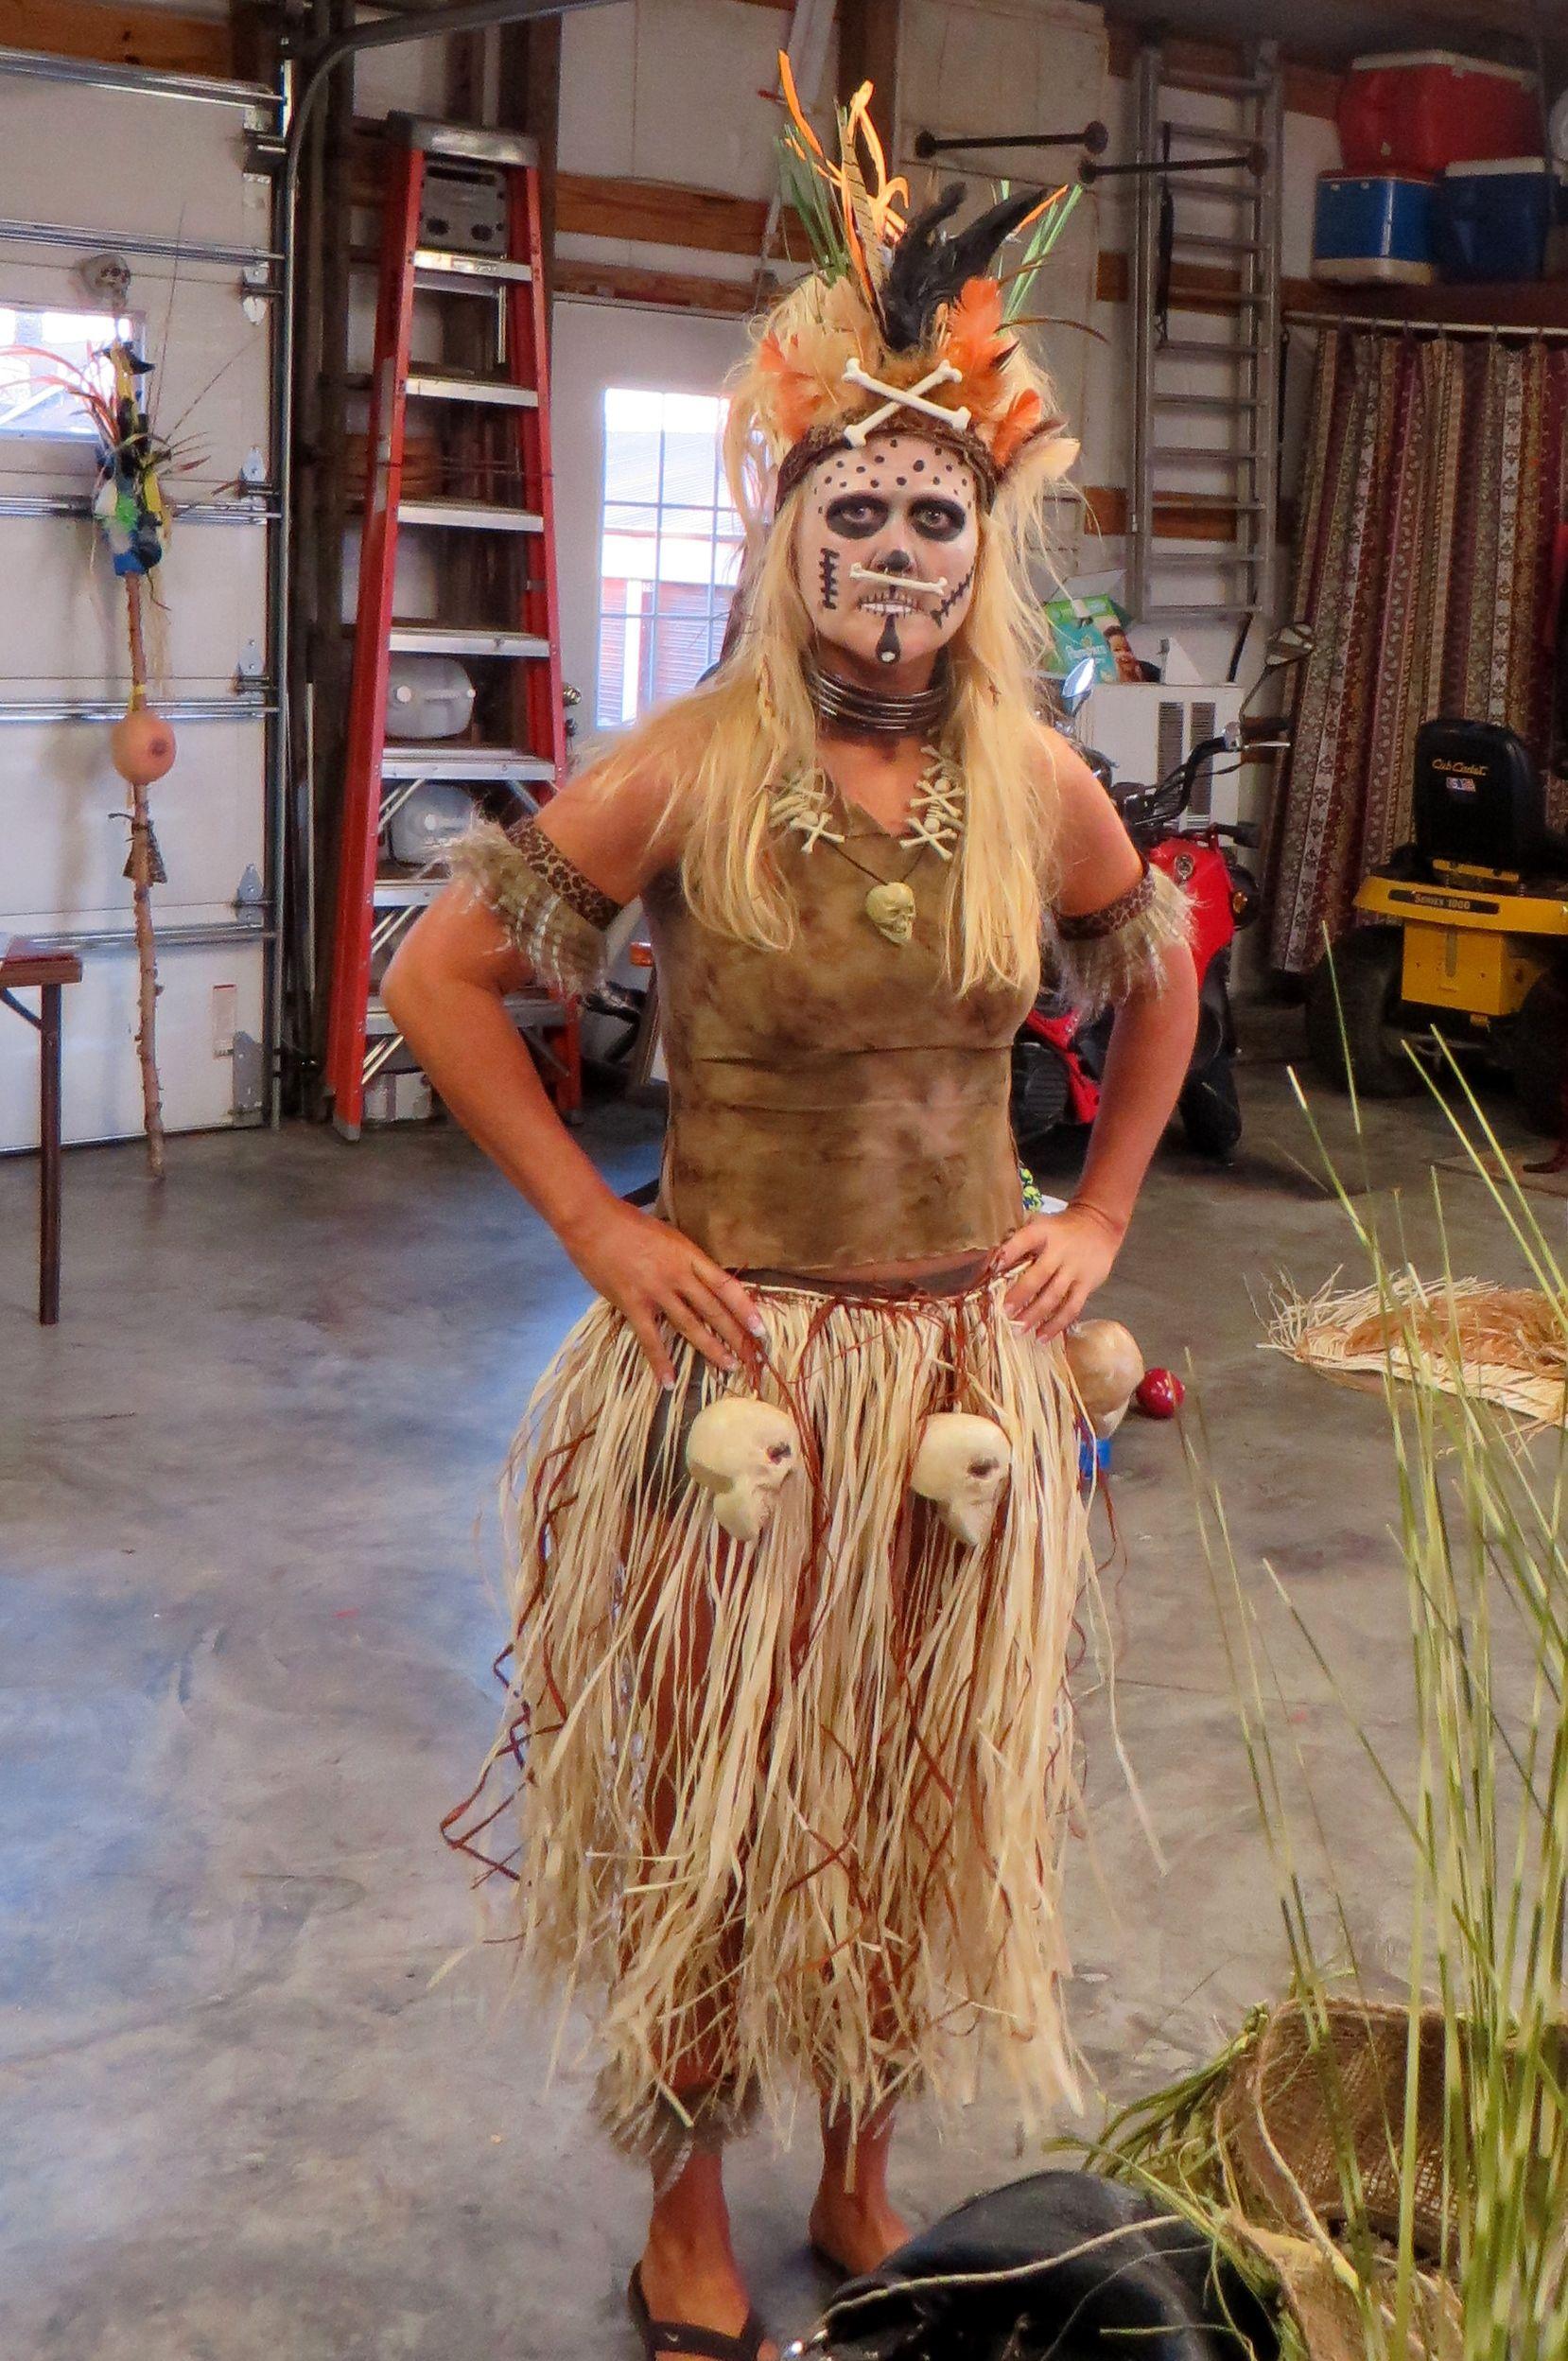 Most Creative Halloween Masks 2020 Tribal headhunter, Great Halloween costume idea.   Most creative